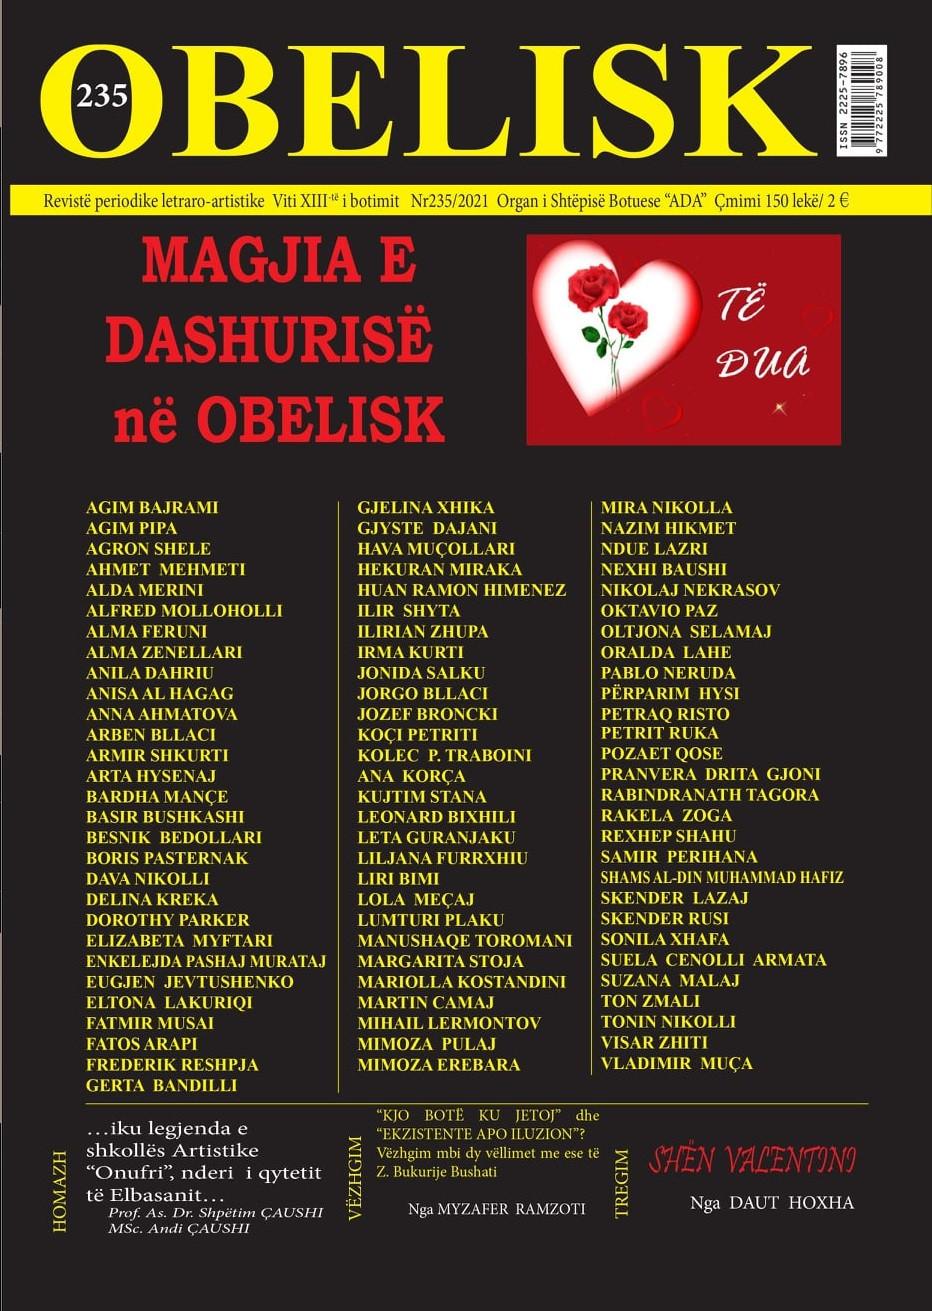 Revista Obelisk Nr. 235